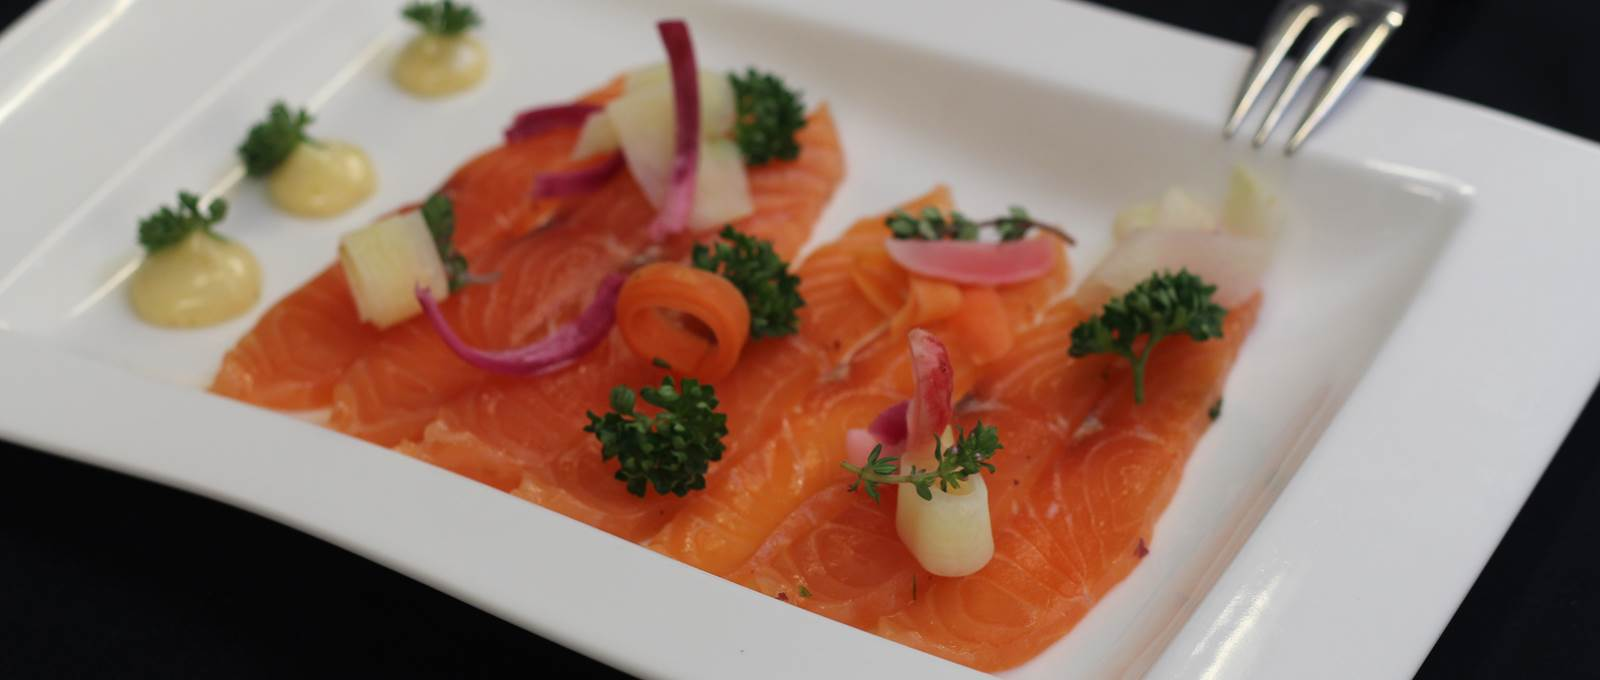 Saumon gravlax restaurant Le Rond Point d'hOr Hossegor